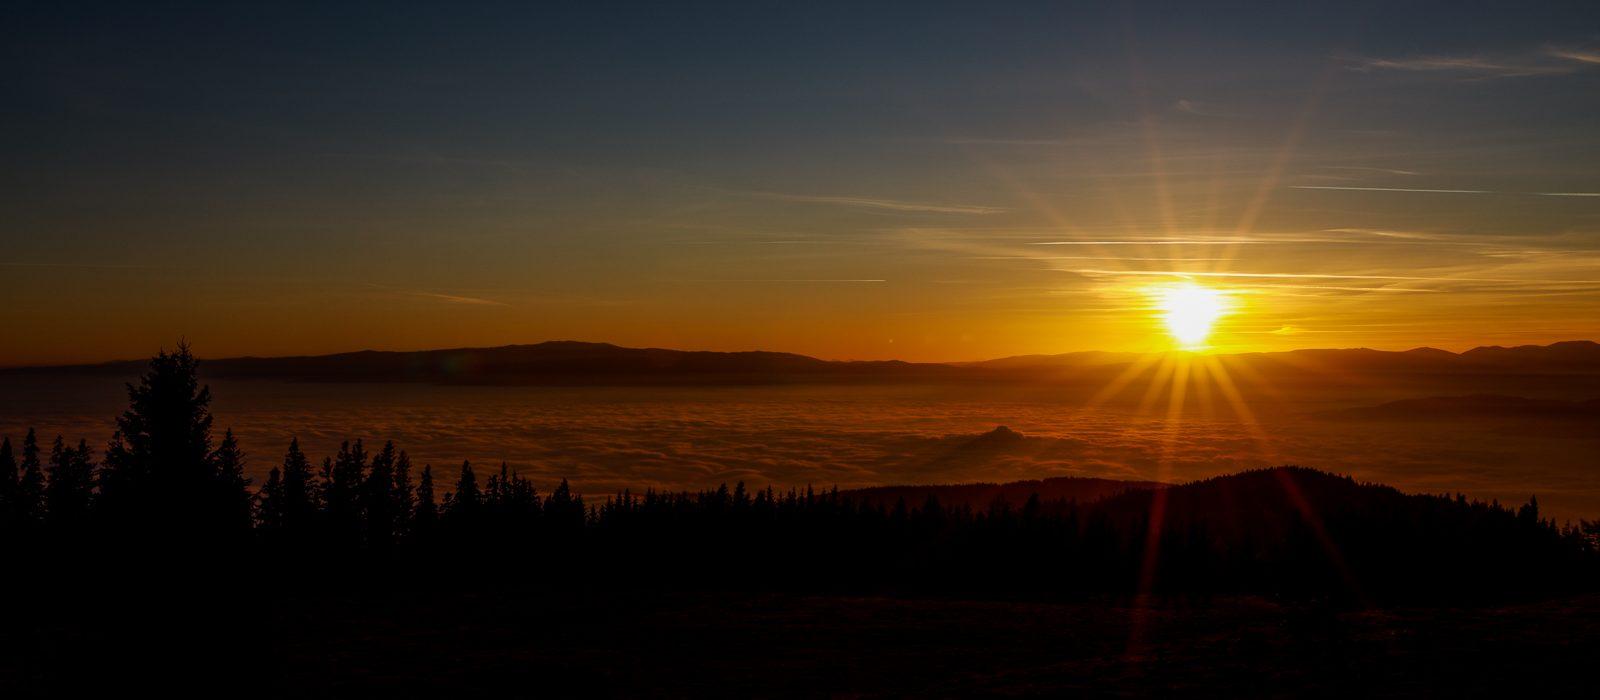 Sonnenuntergang über Nebelmeer